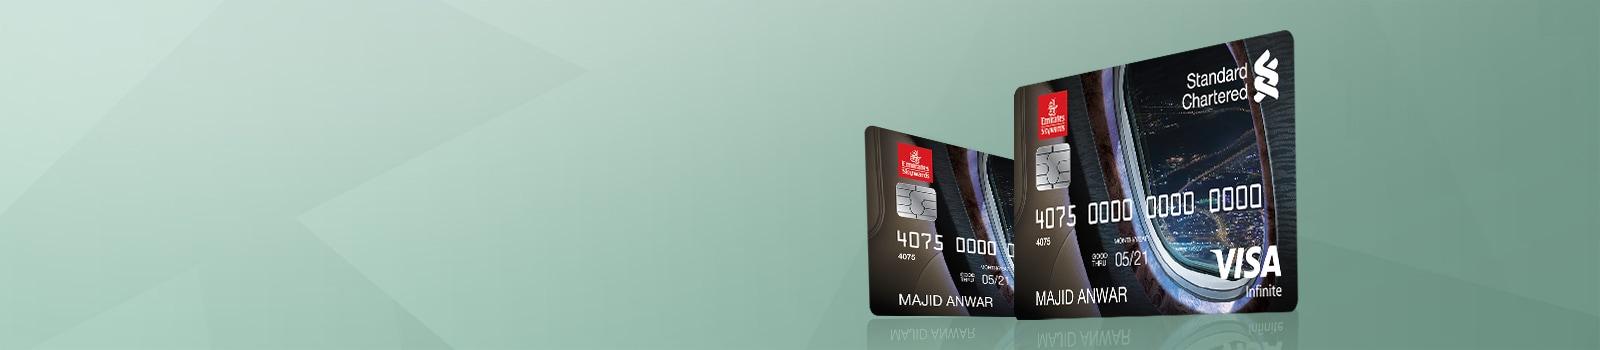 Standard Chartered Emirates Infinite Credit Card